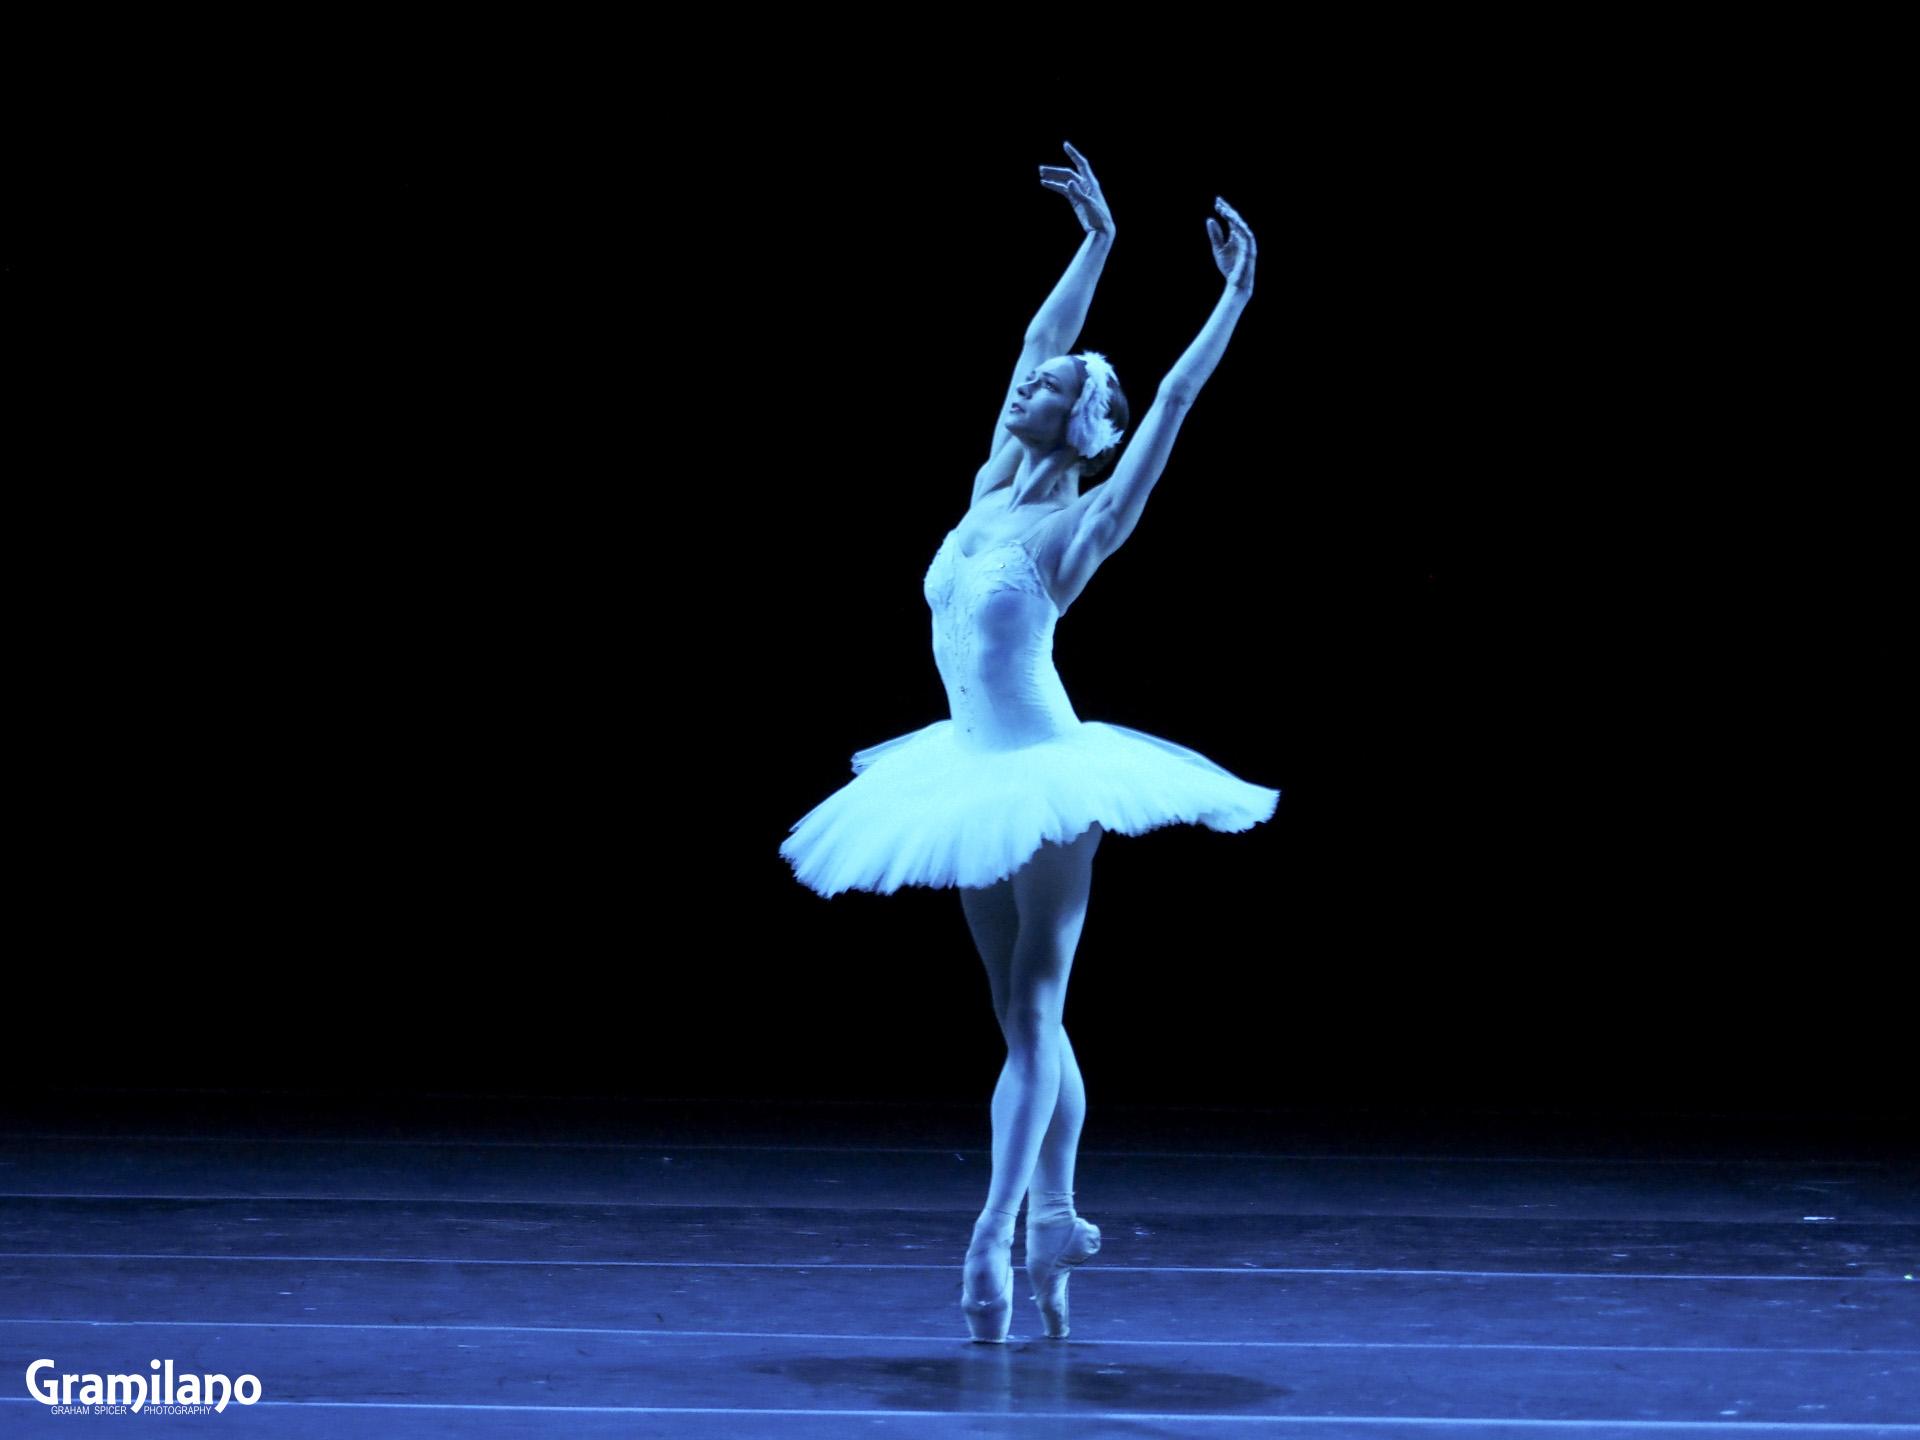 Polina Semionova in The Dying Swan